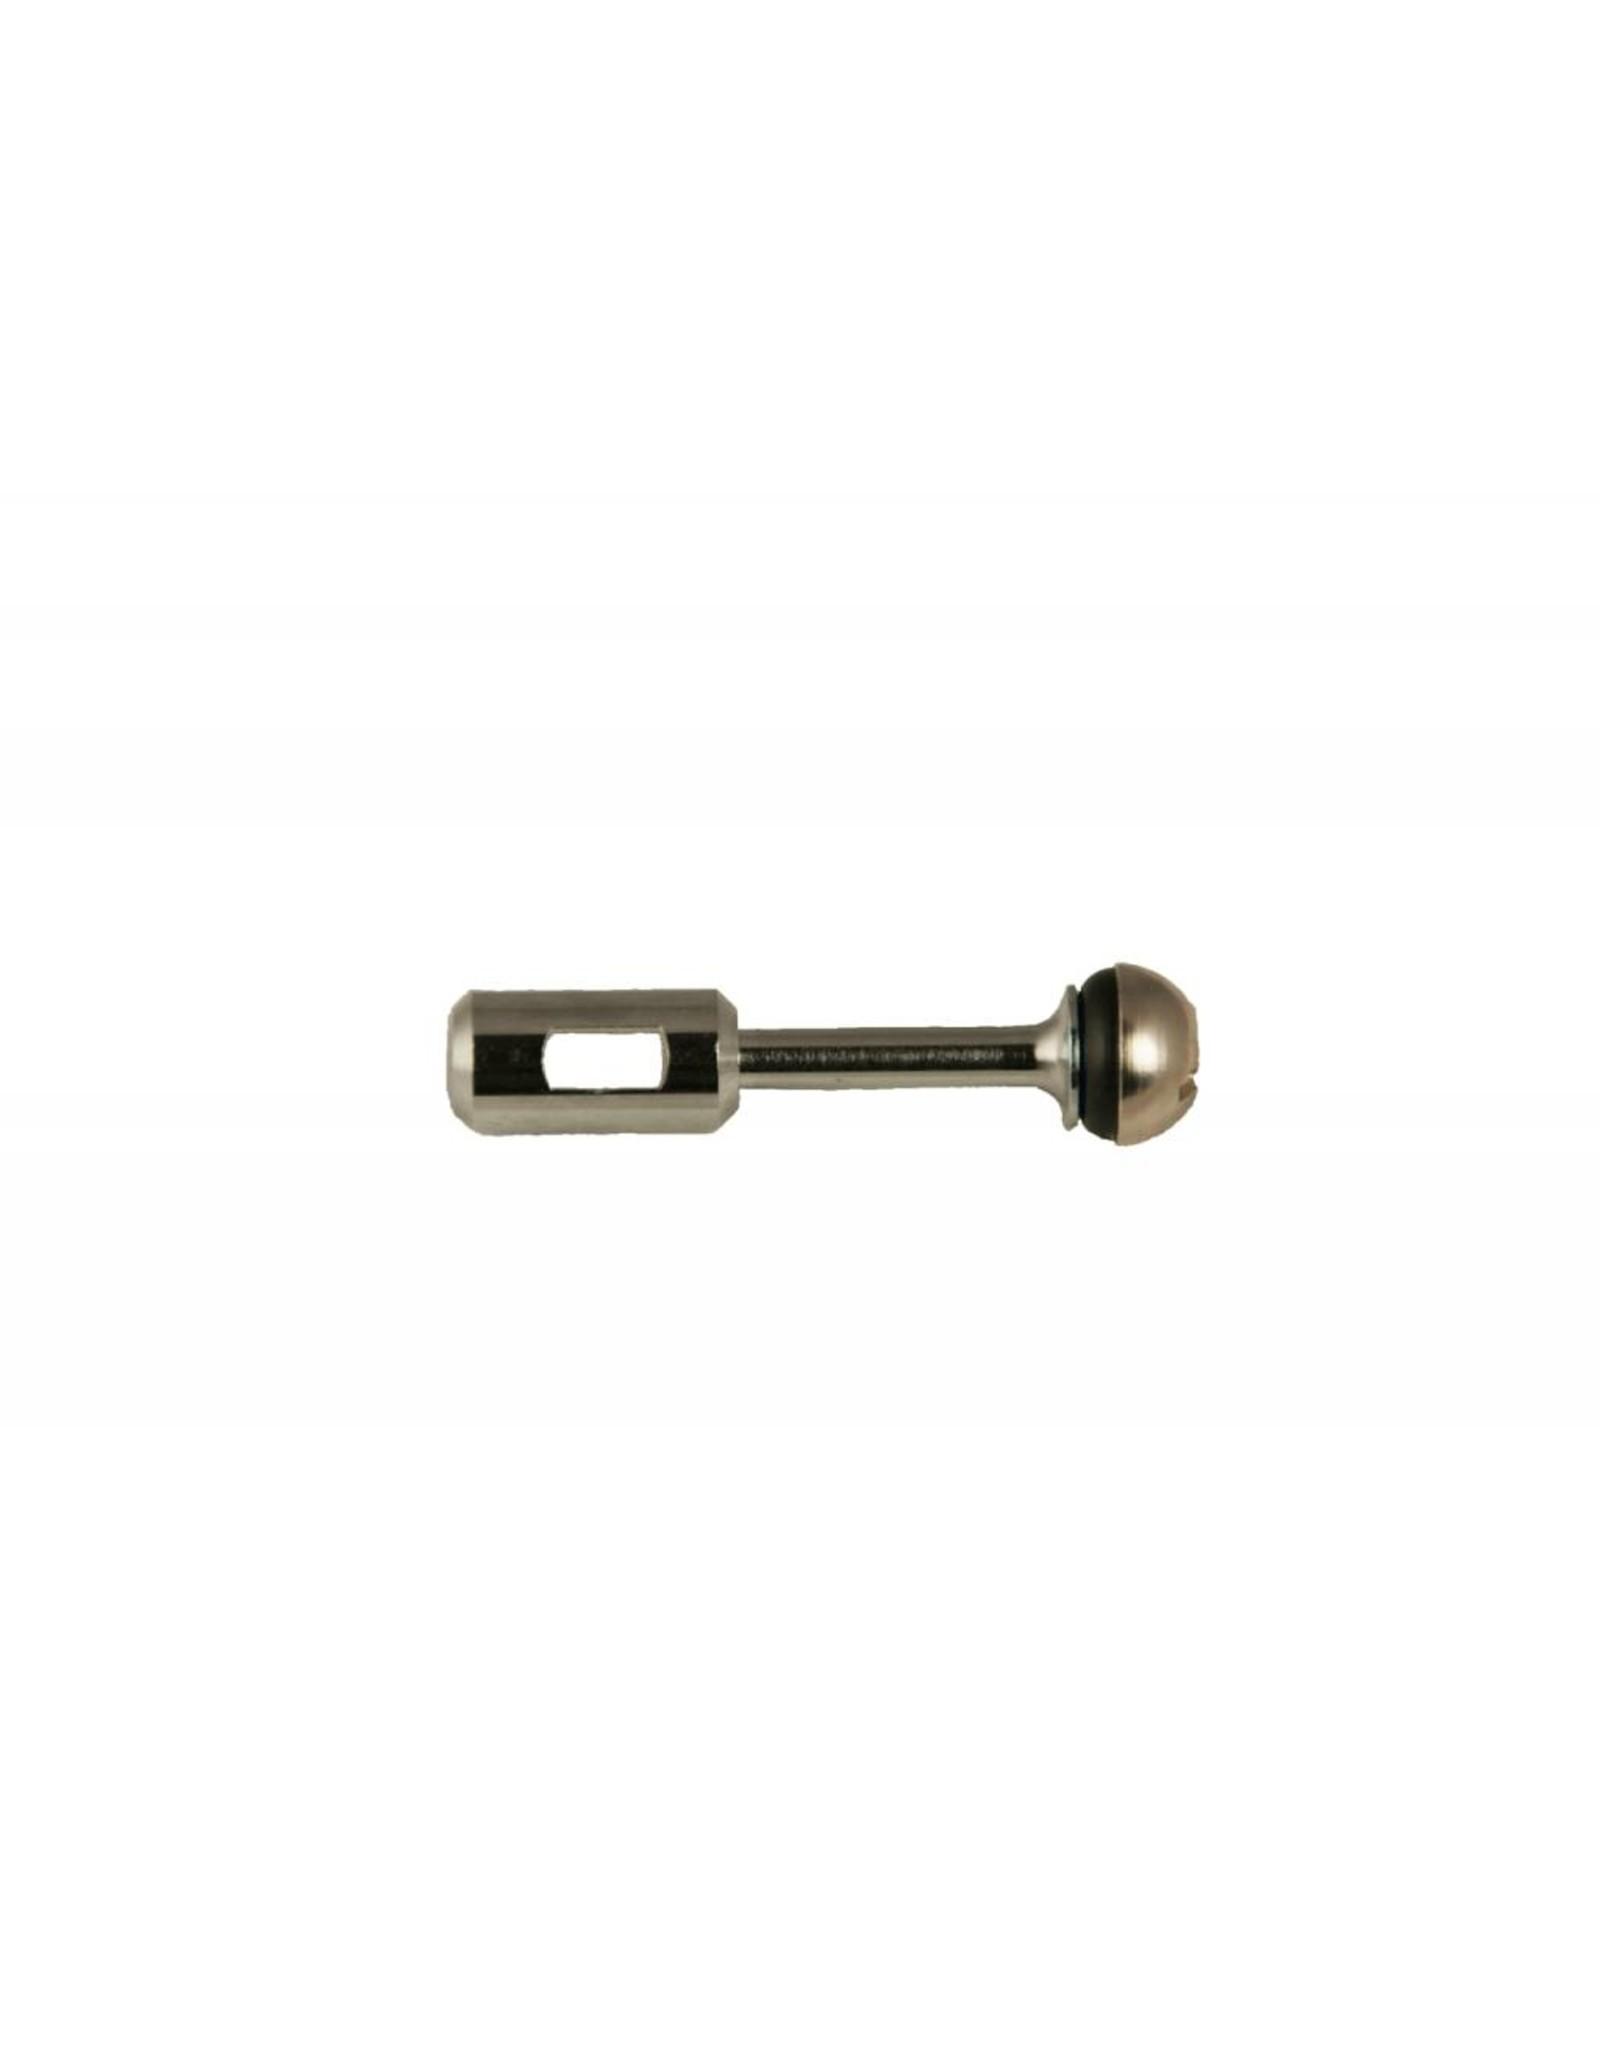 Foxx Equipment Beer Faucet Plunger Assembly (Chrome)